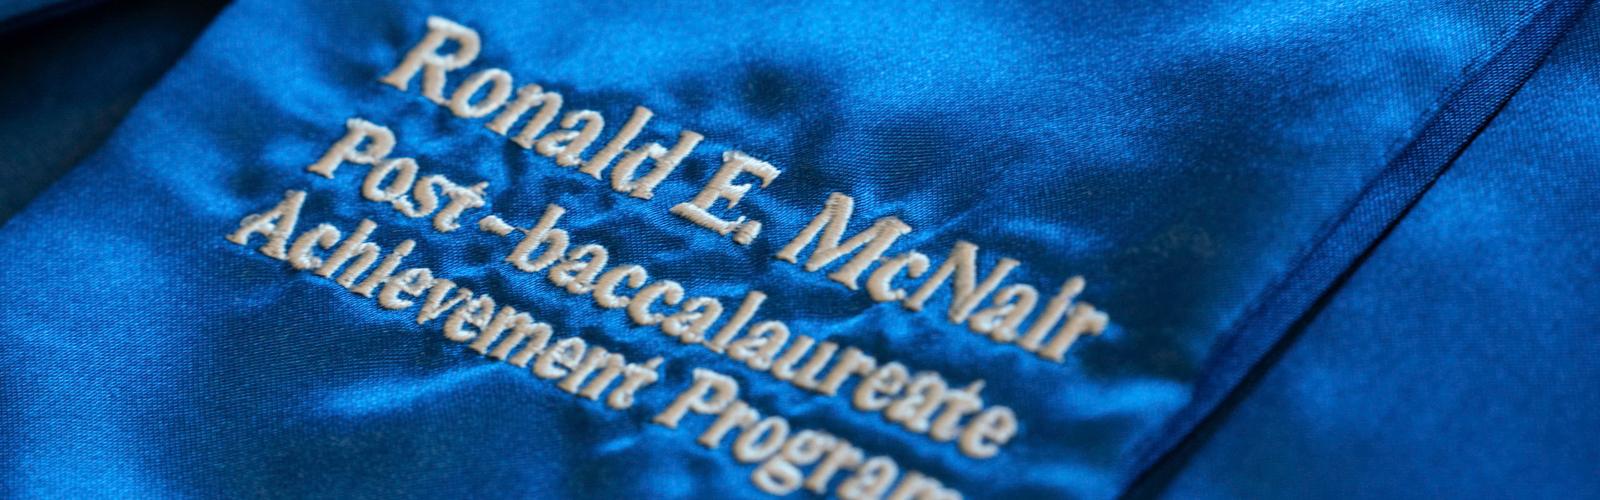 "A blue graduation stole with white lettering reading ""Ronald E. McNair Postbaccalaureate Achievement Program"""